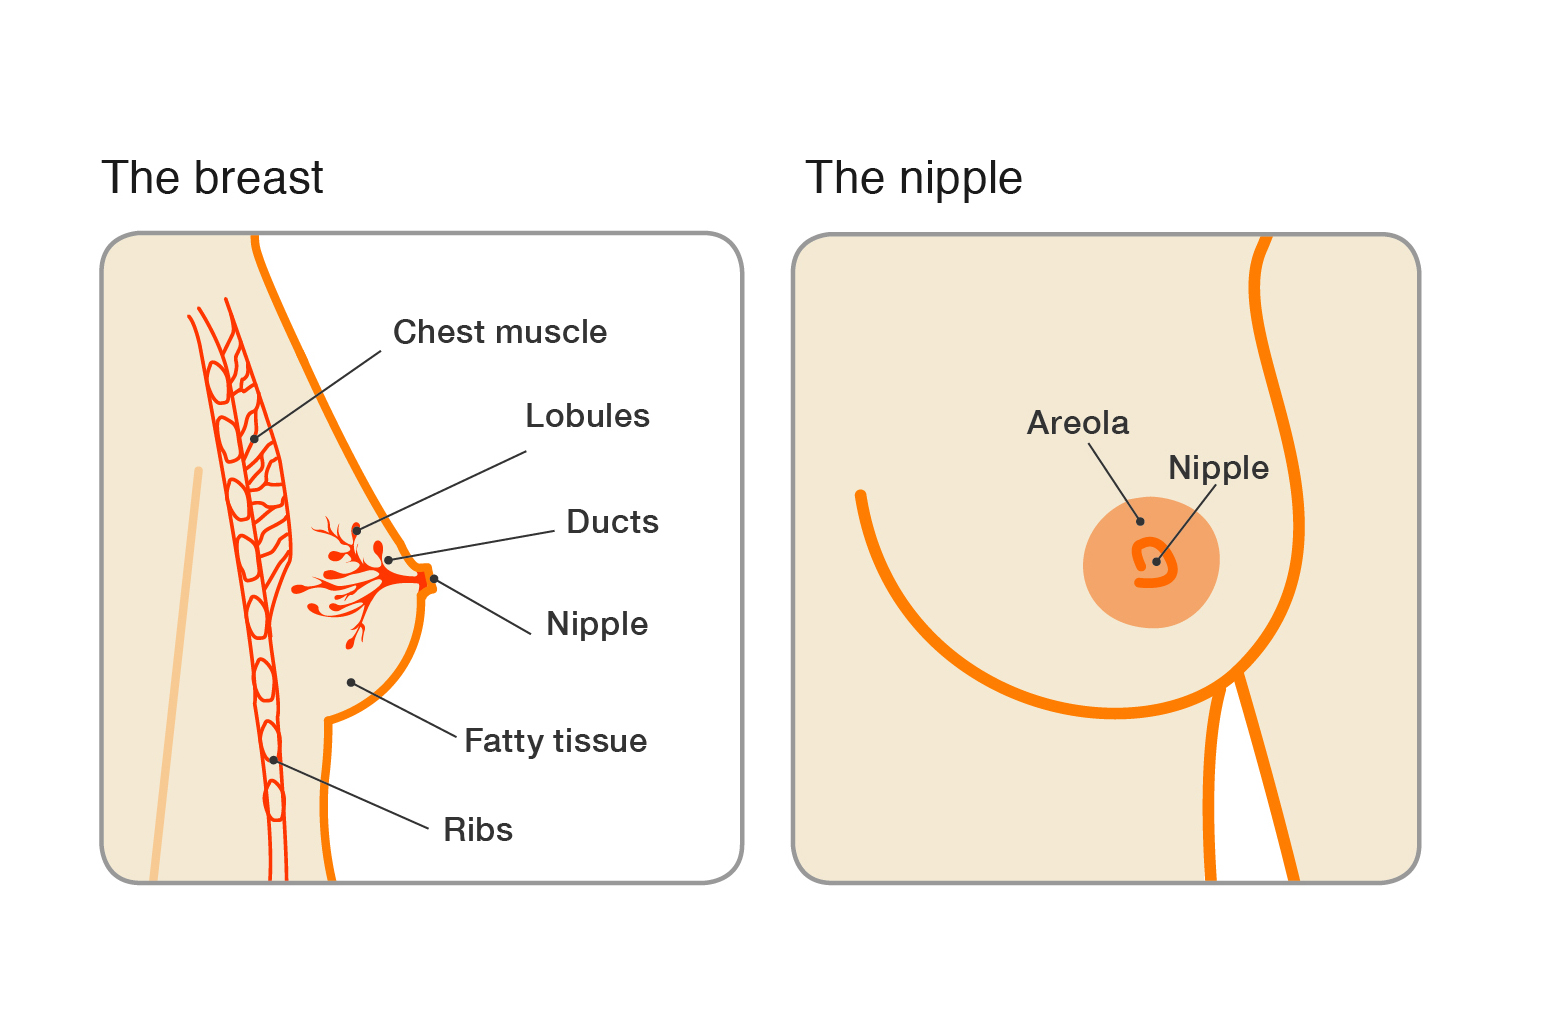 papillomas during pregnancy tokareva n cadou pentru paraziți distructivi